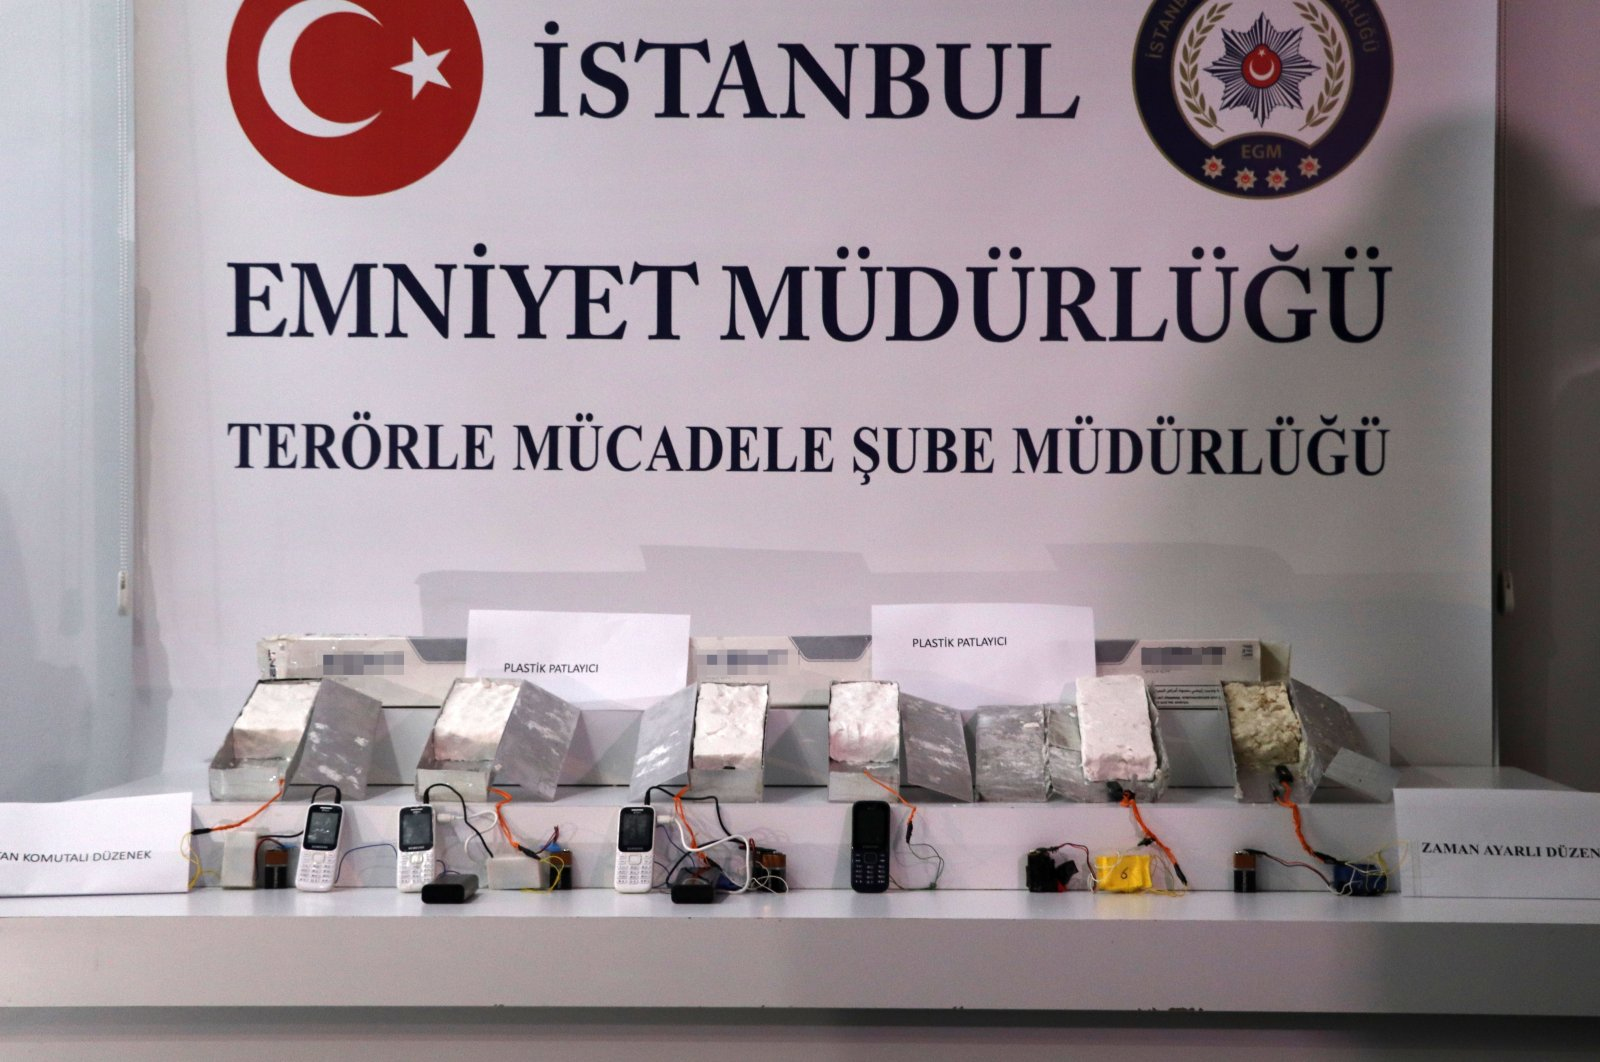 Turkish police display seized explosives belonging to PKK terrorist group in Istanbul, Turkey, April 29, 2021. (IHA Photo)